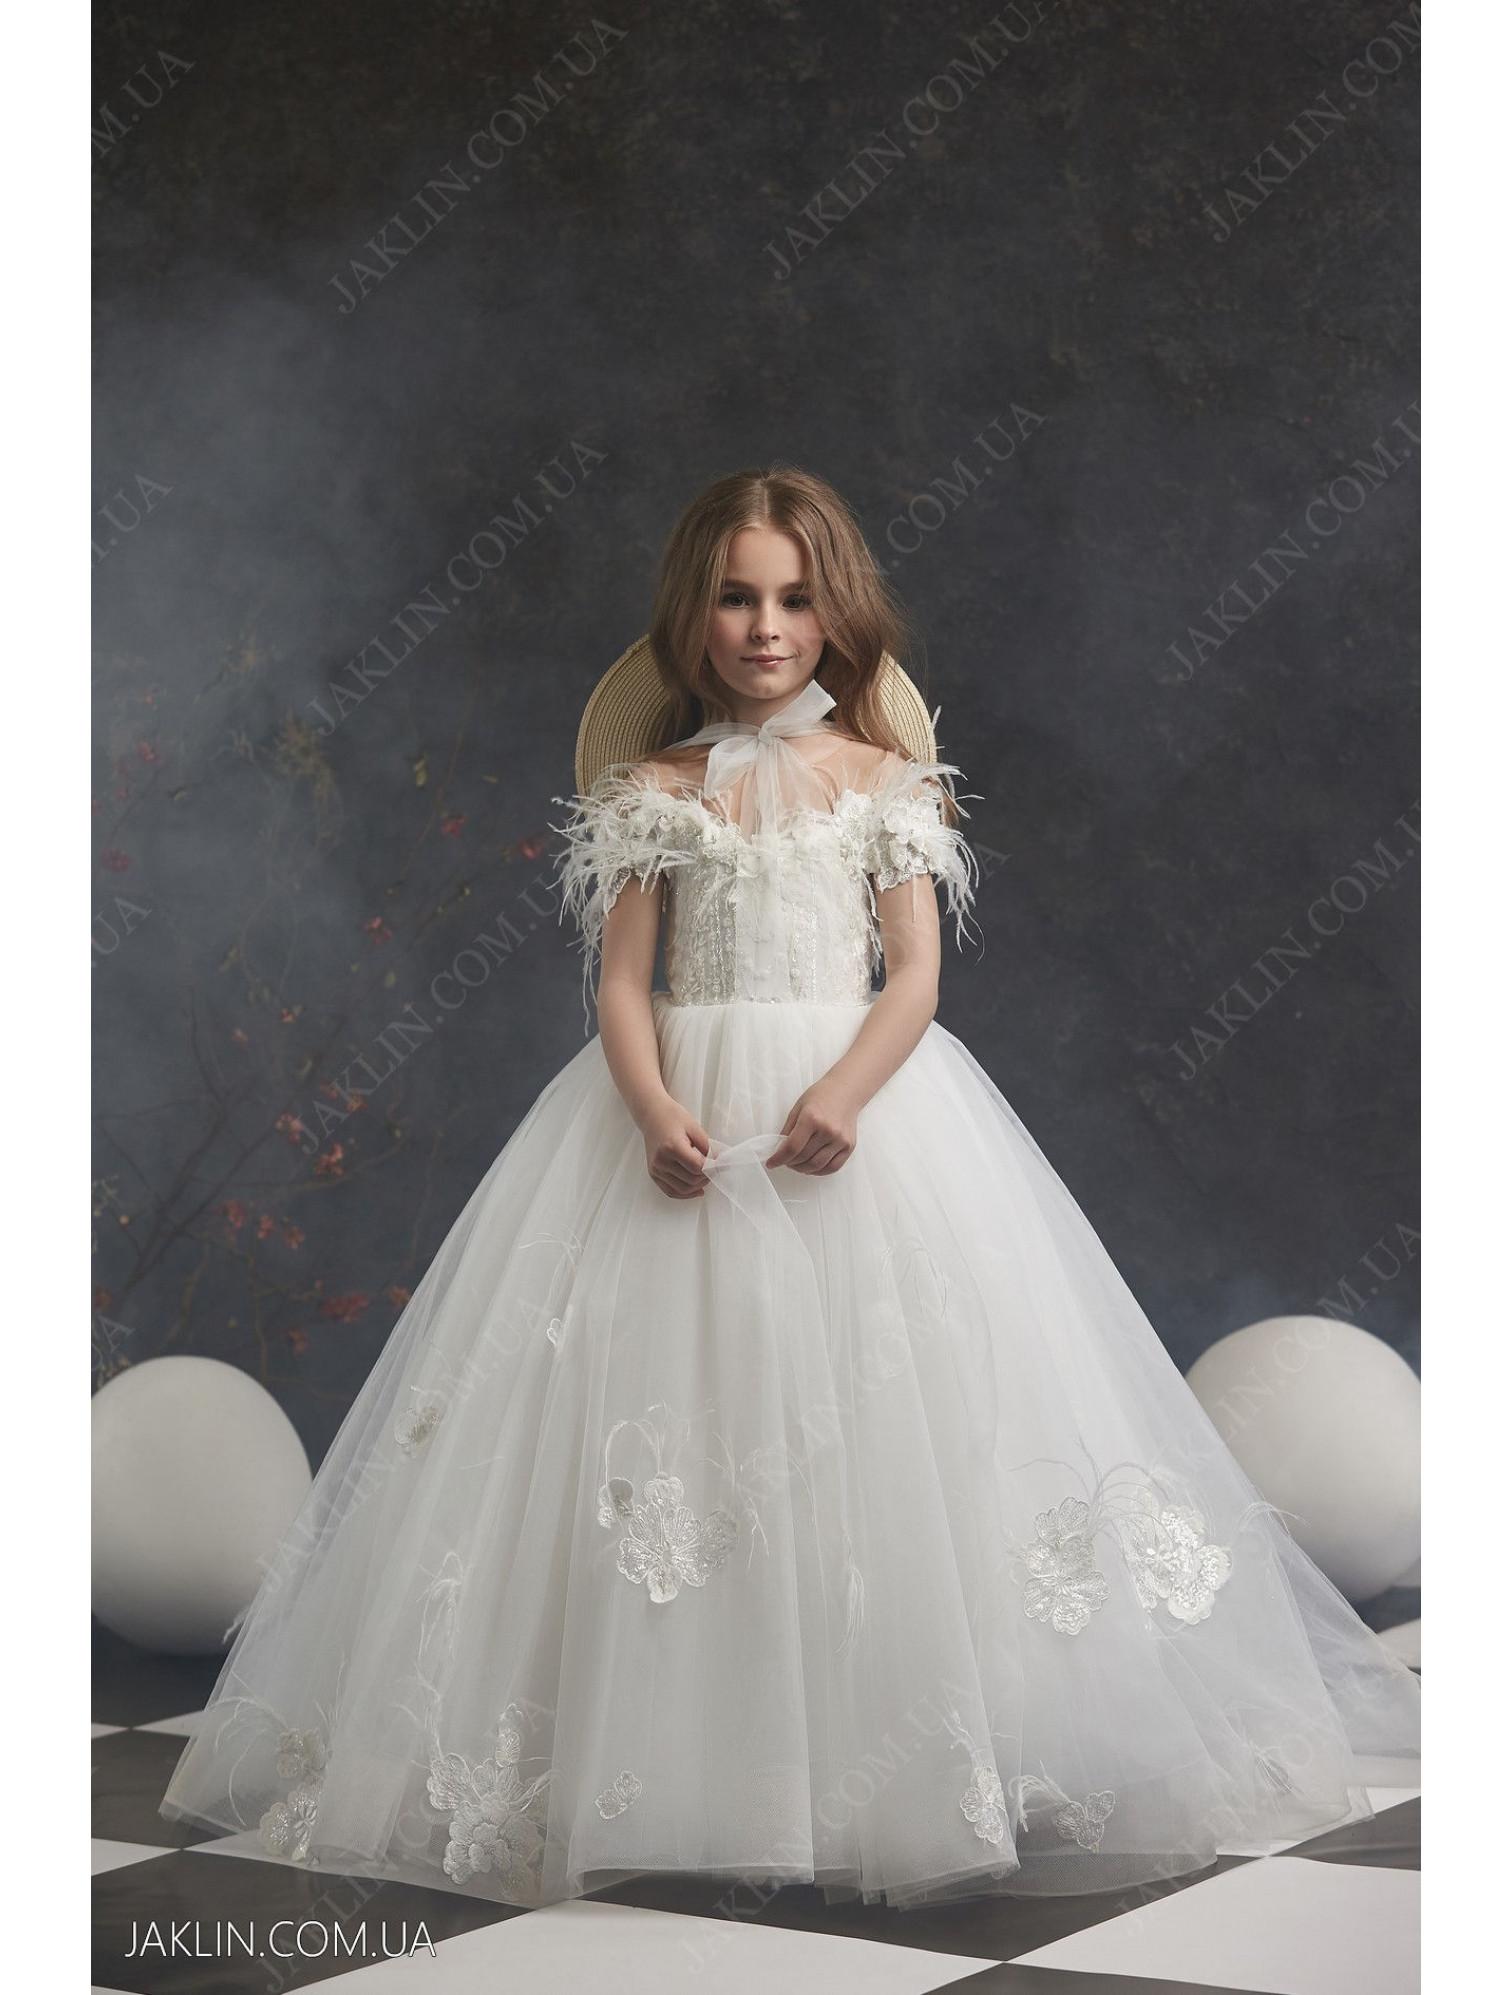 Child dress 3045